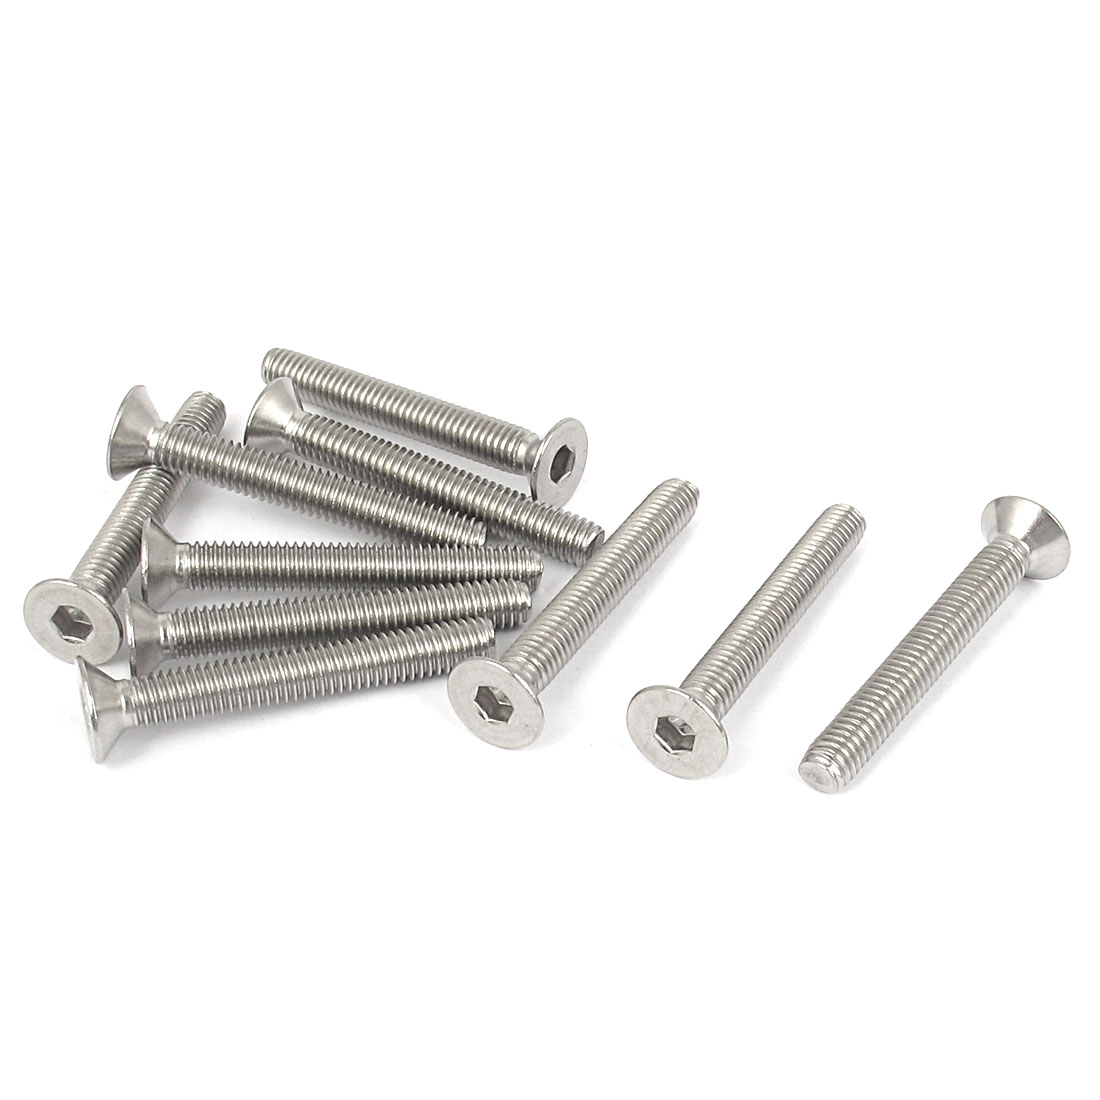 M6 x 45mm Metric 304 Stainless Steel Hex Socket Countersunk Flat Head Screw Bolts 10PCS